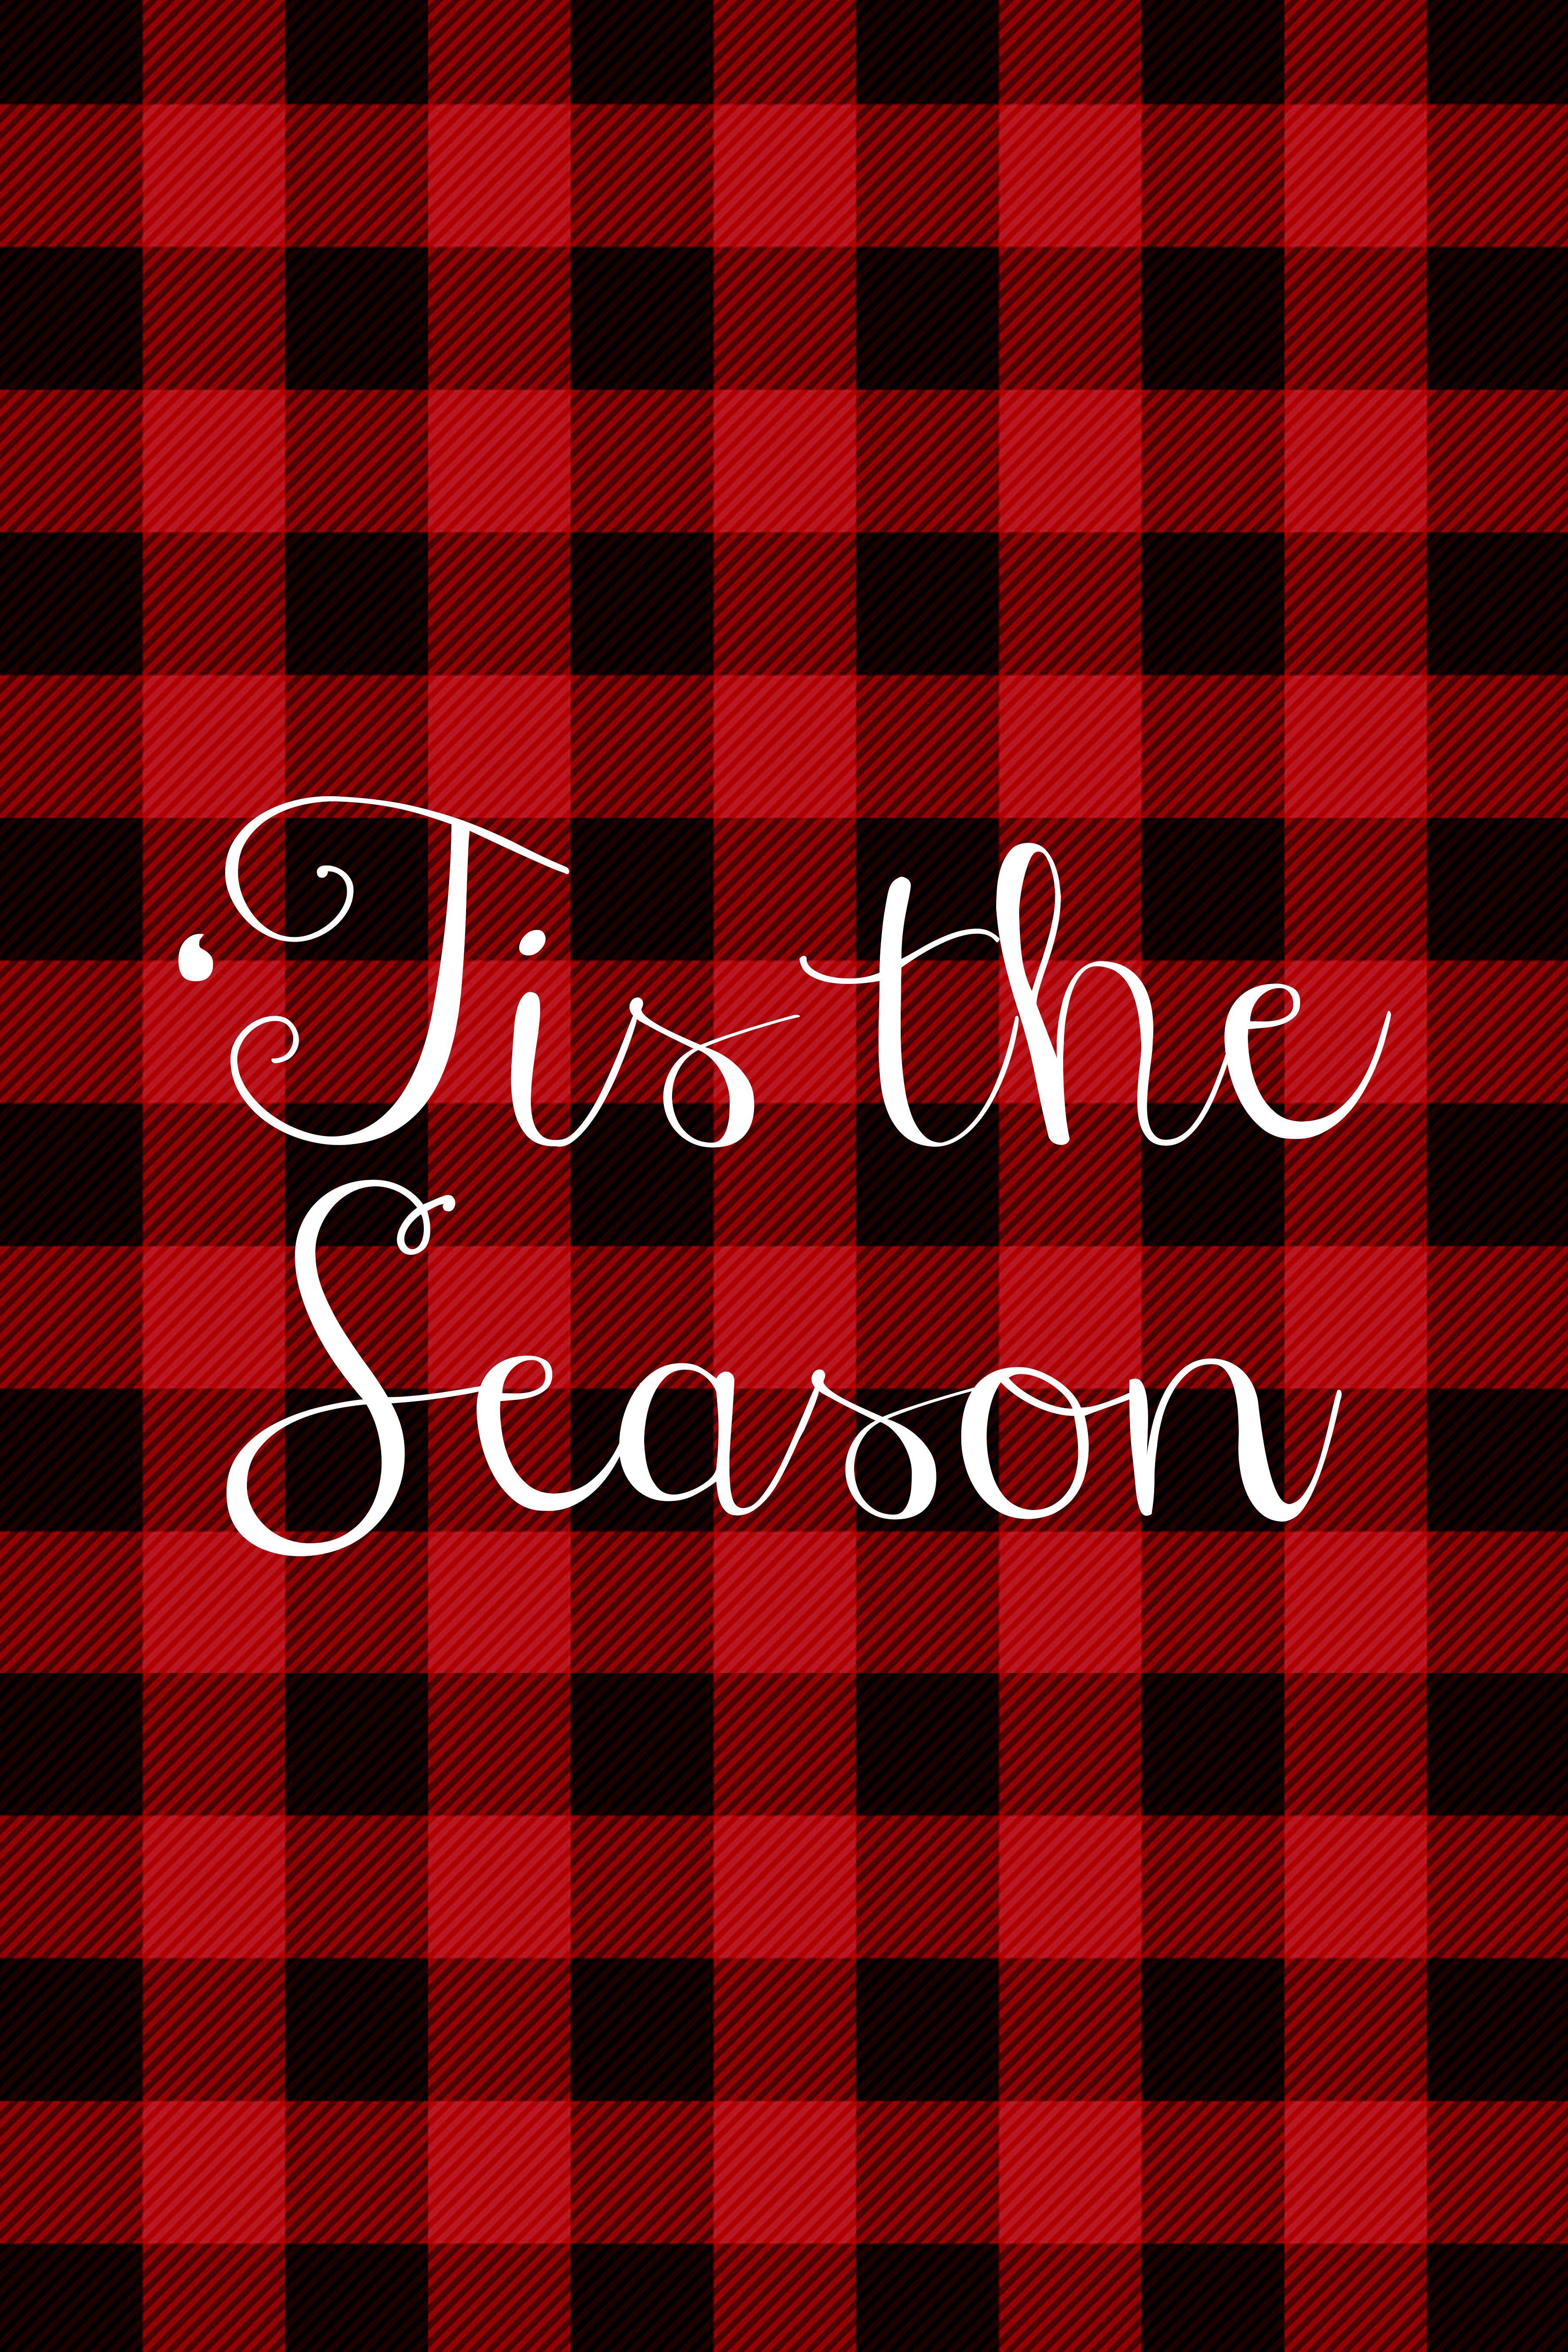 'Tis the season red flannel free Christmas printable